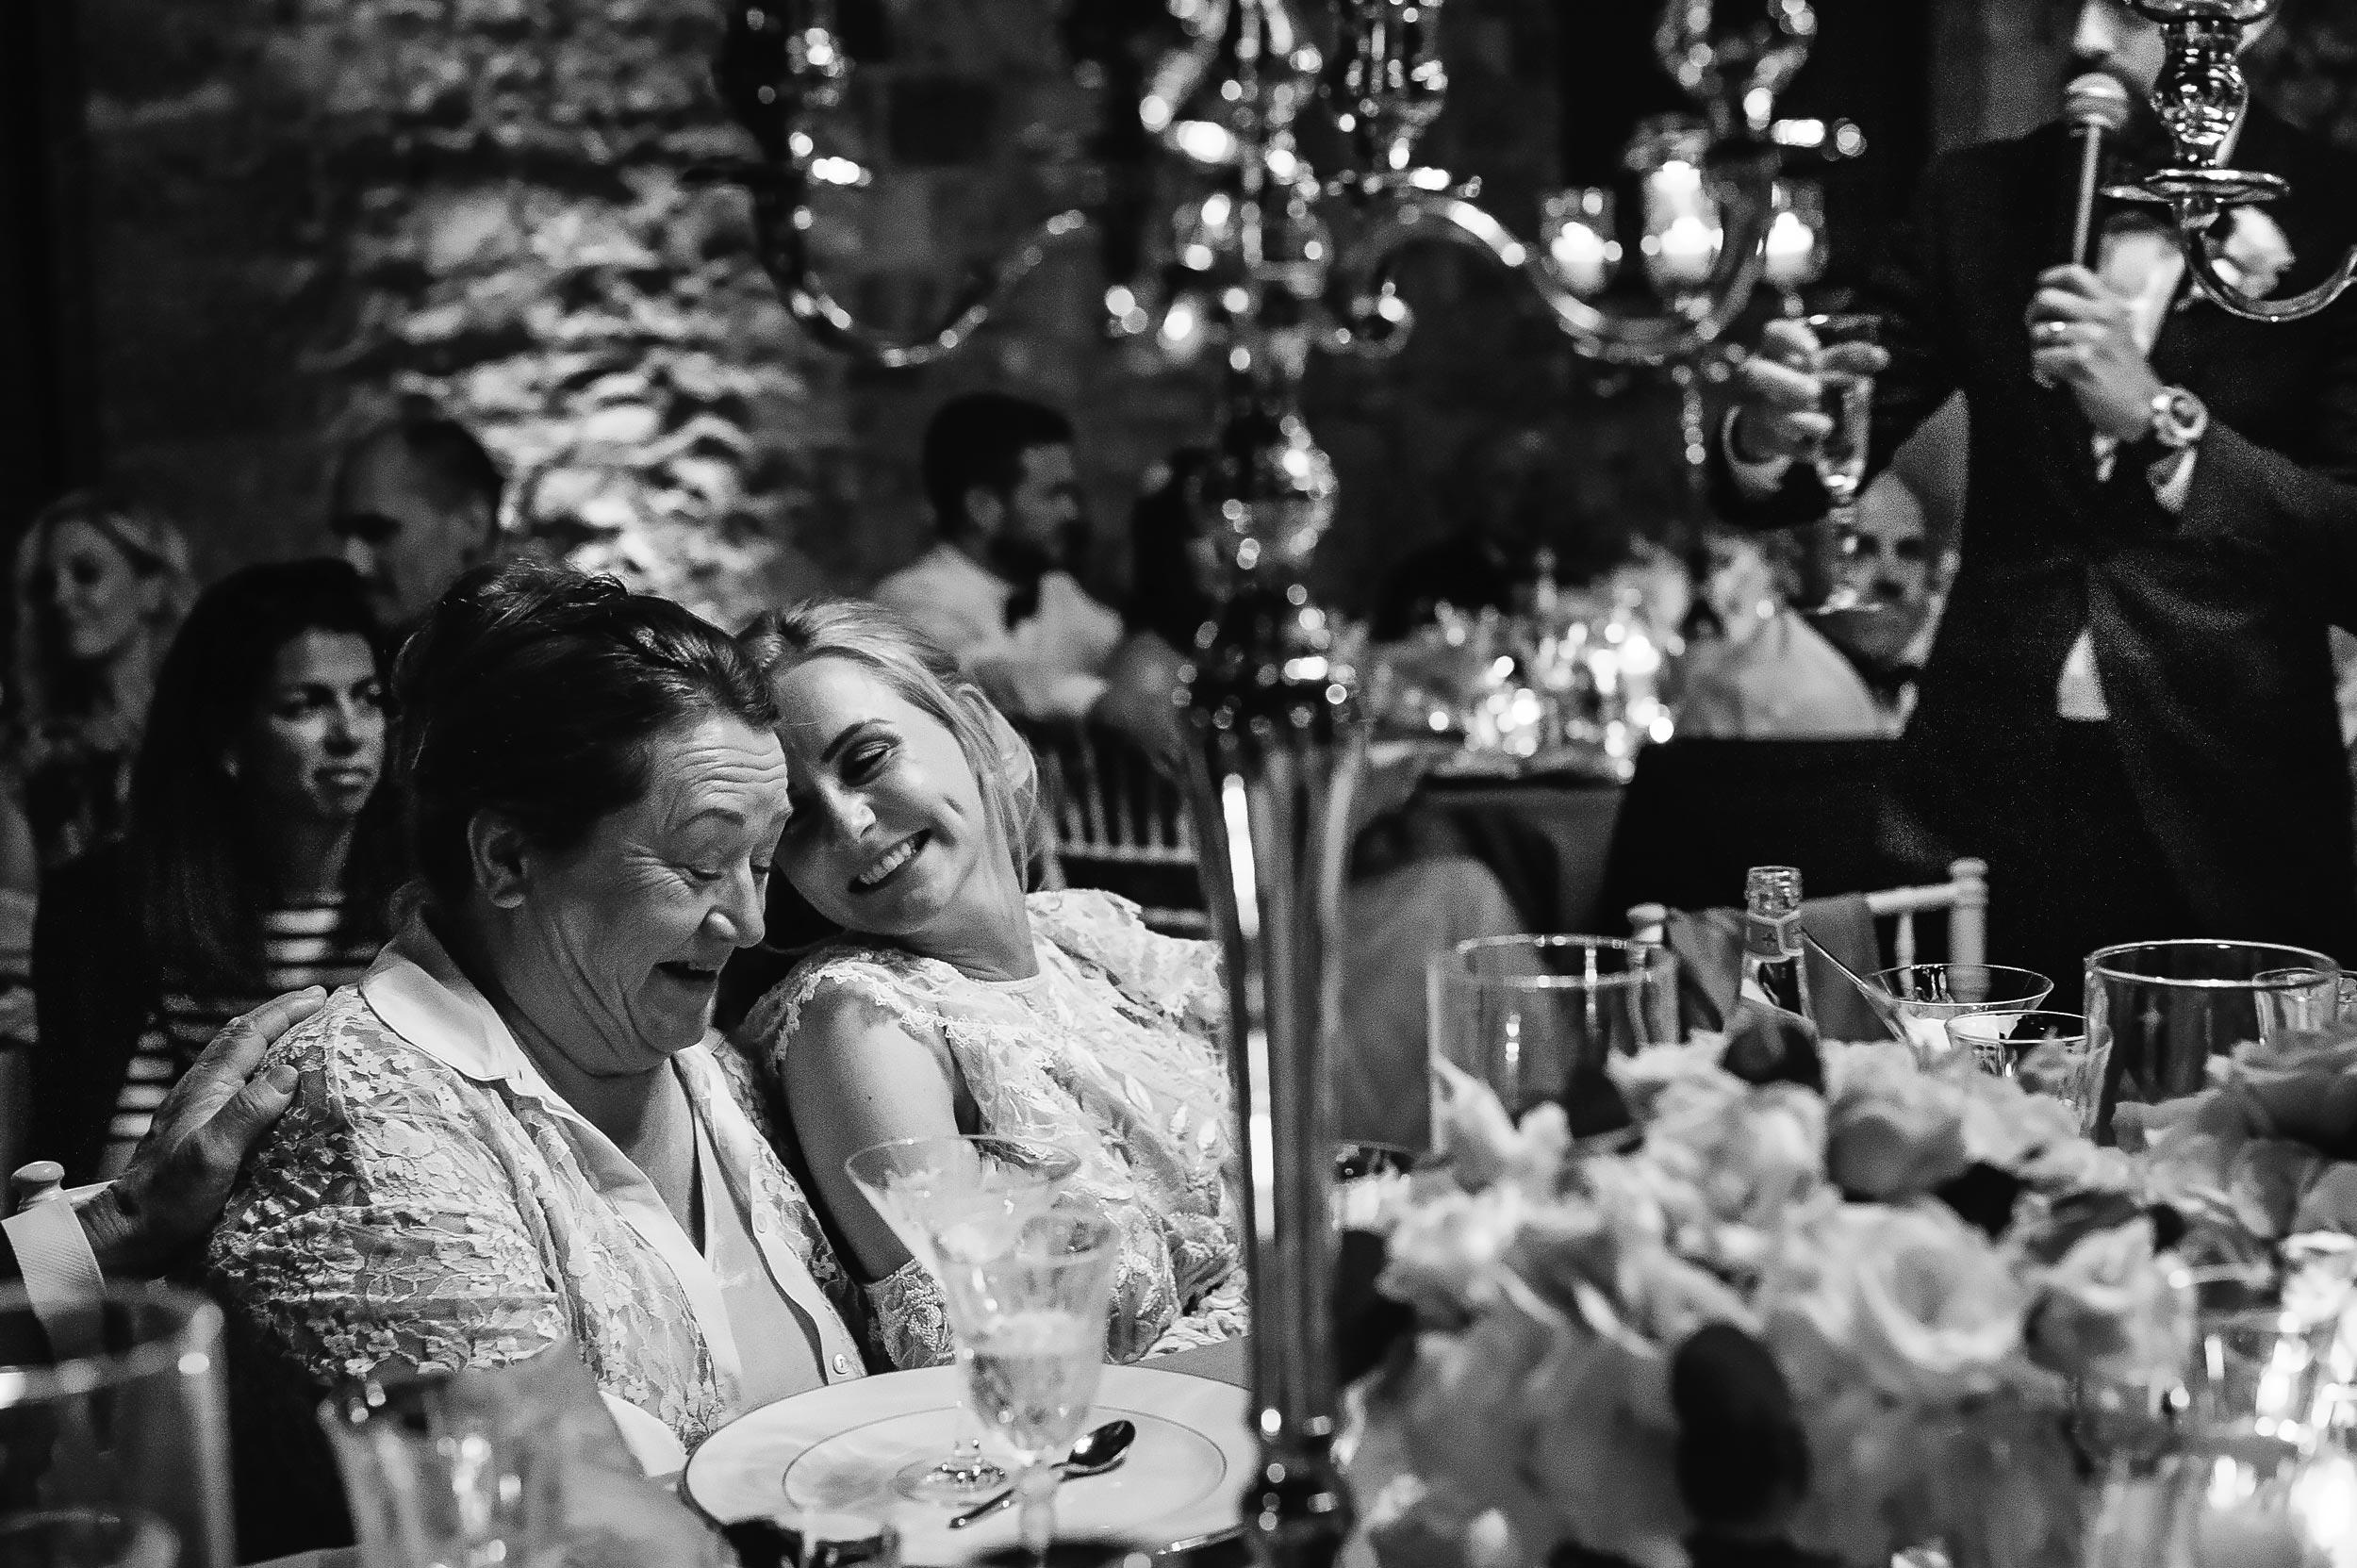 moving-speech-luxury-wedding-bride-groom-mom-parents-black-and-white-documentary-wedding-photography-by-Alessandro-Avenali.jpg